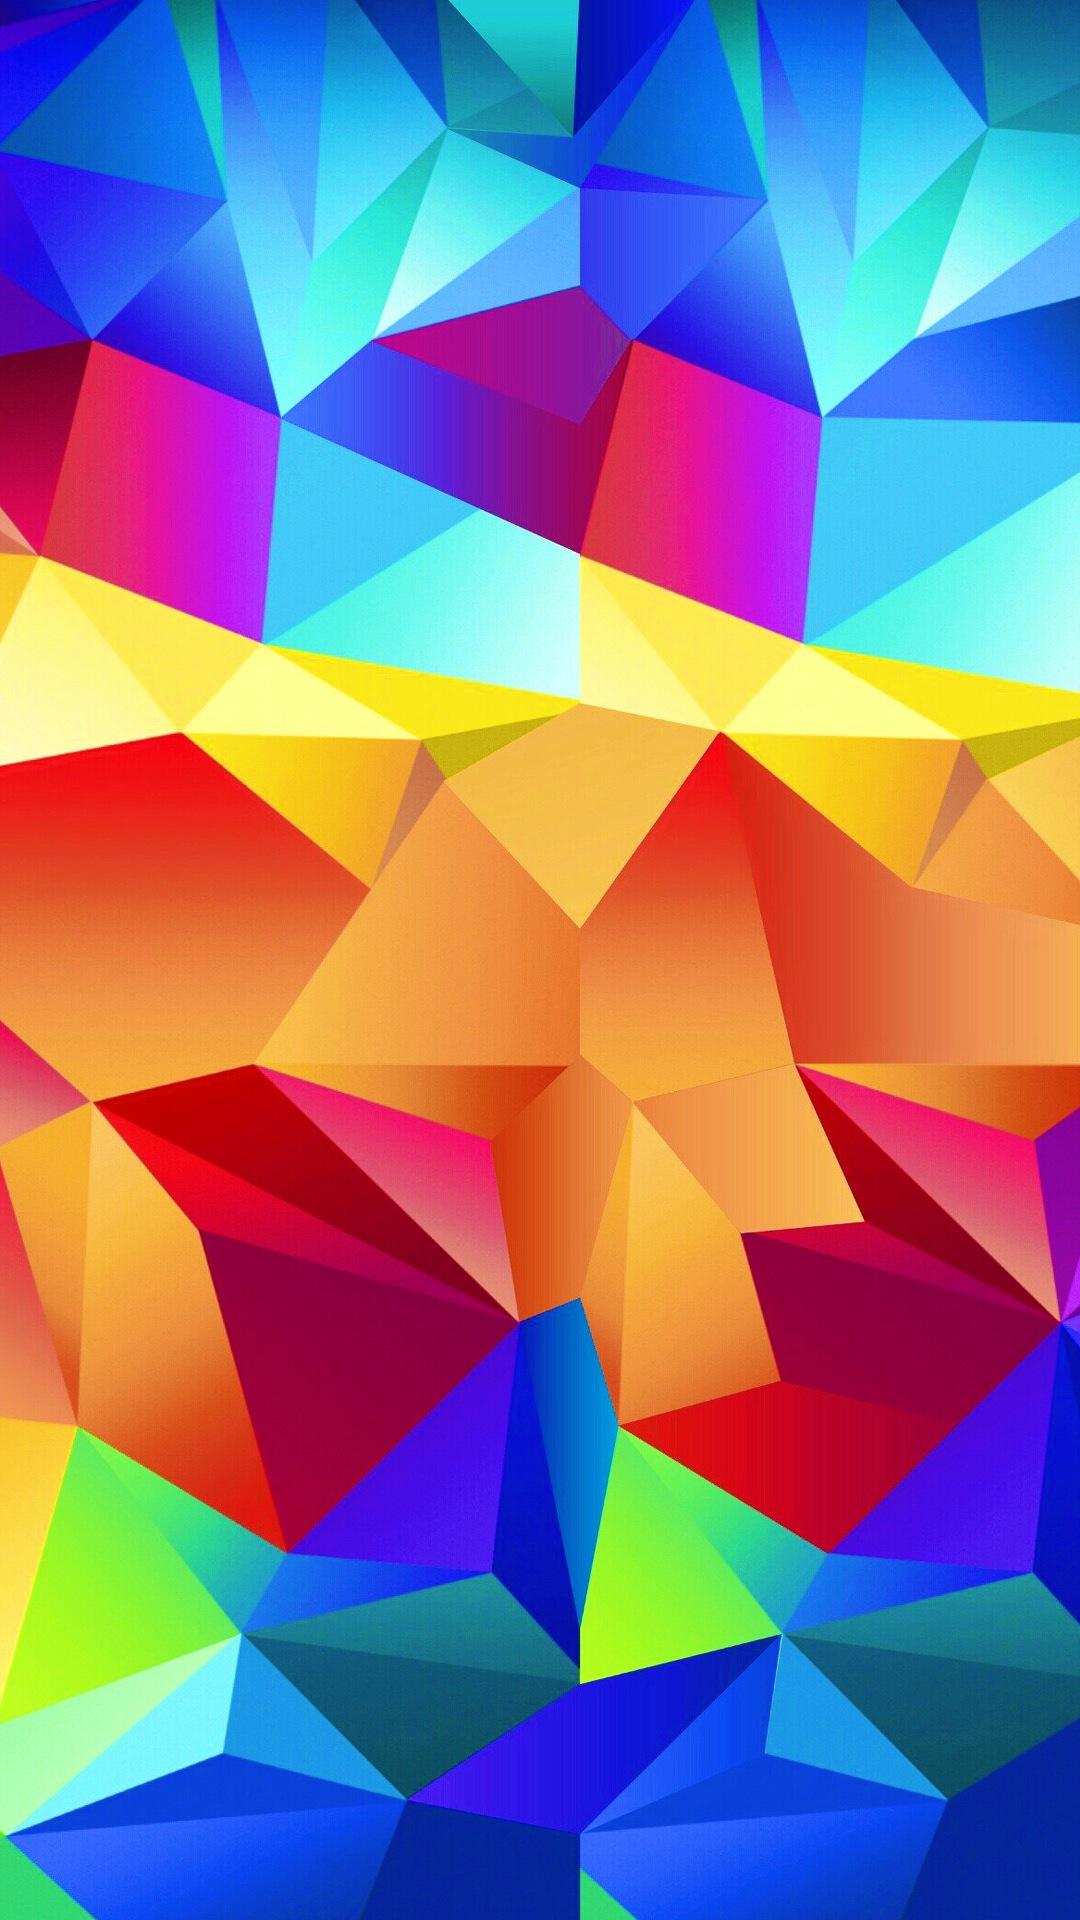 Animated Fish Wallpaper Hd Free Download Phone Wallpapers Hd Pixelstalk Net